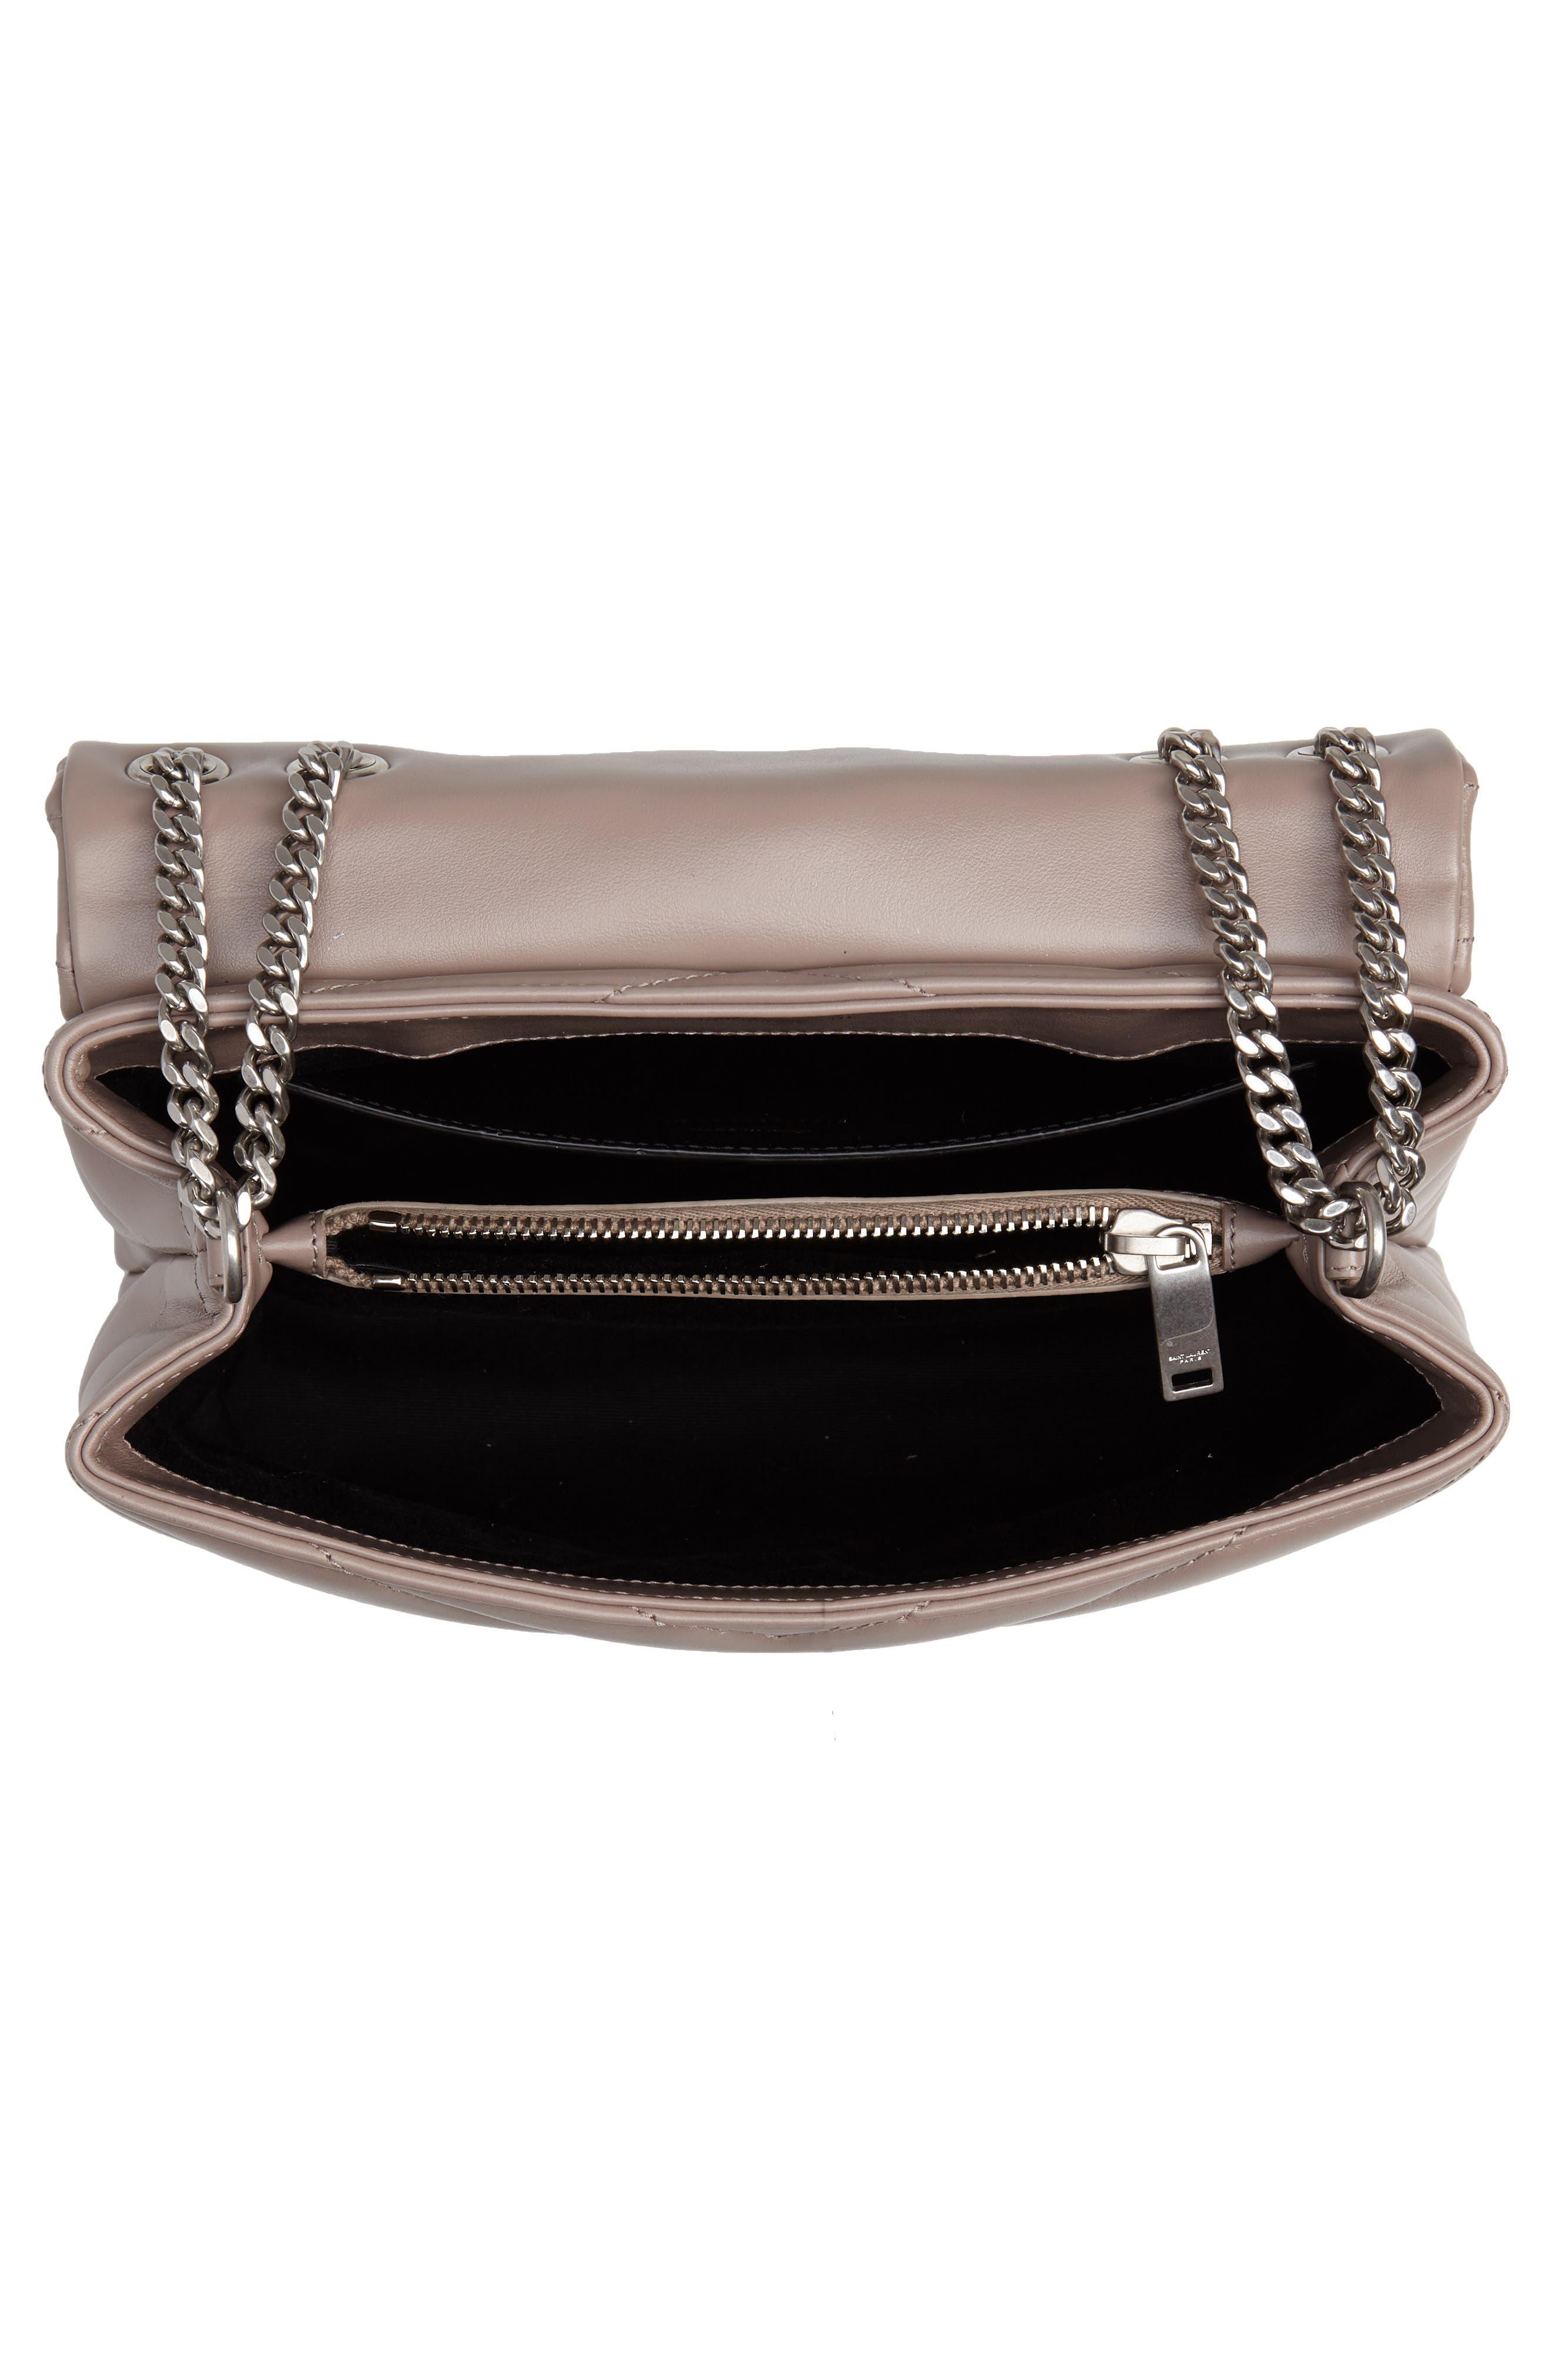 Small Loulou Matelassé Leather Shoulder Bag,                             Alternate thumbnail 4, color,                             TAUPE SABLE